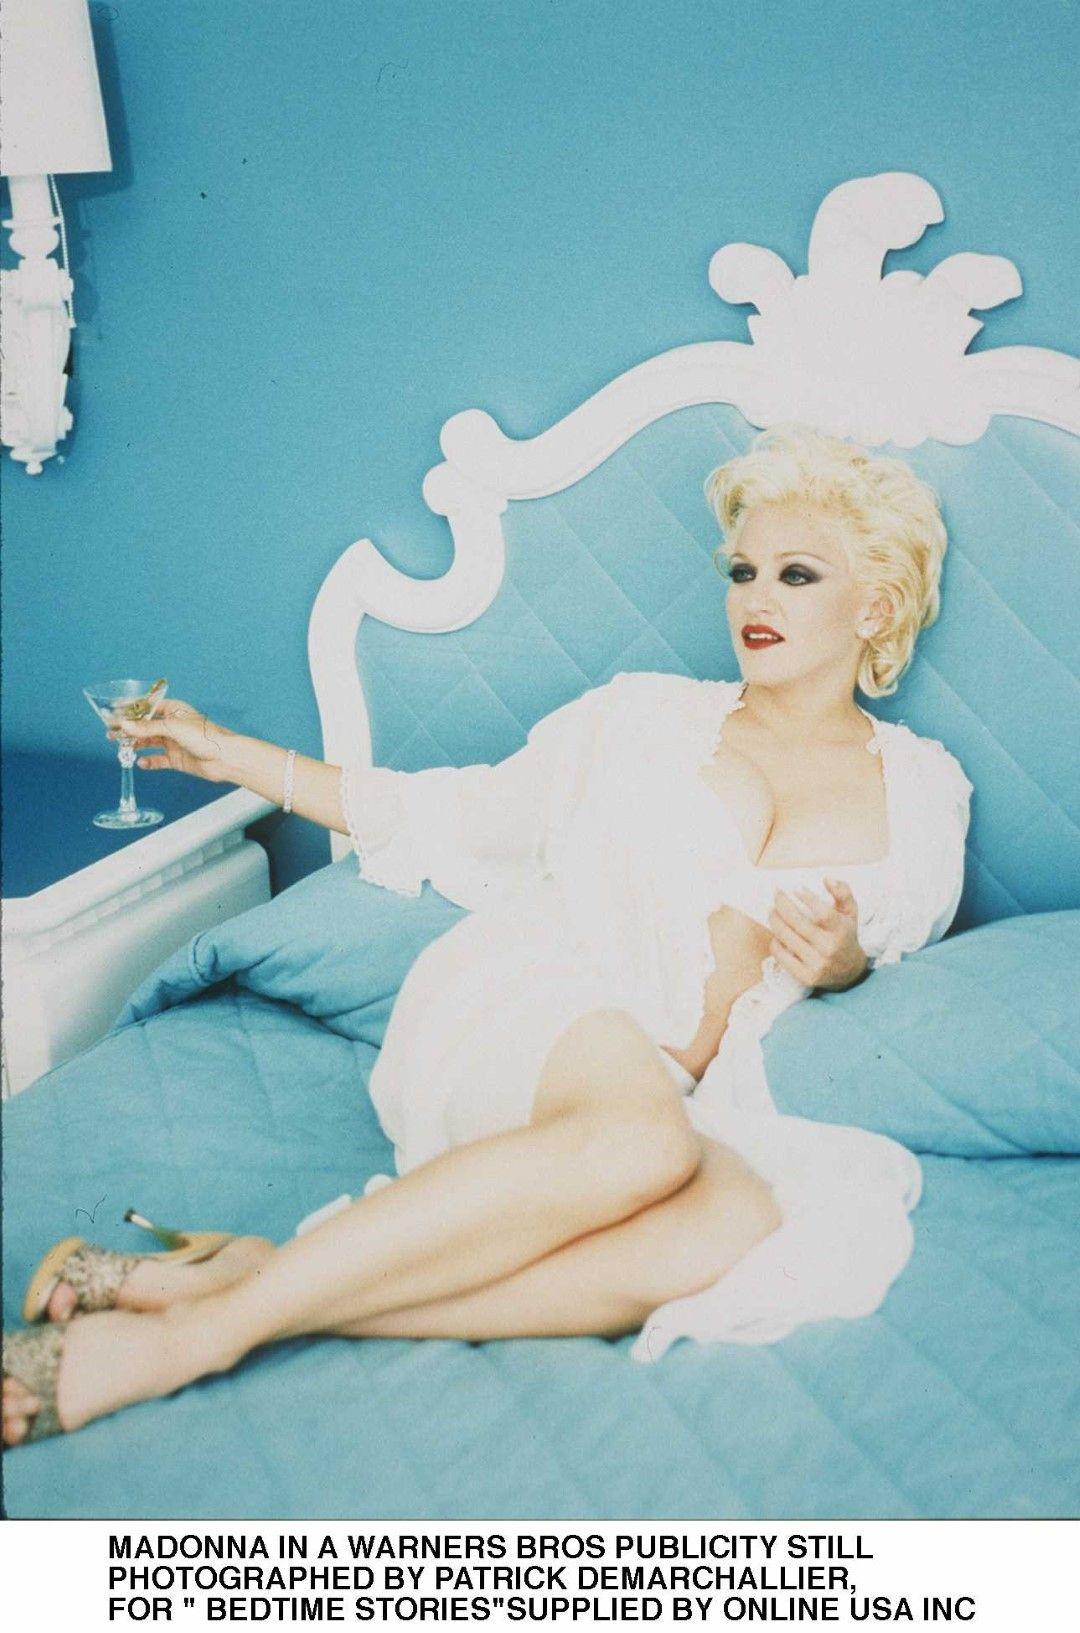 Bedtime Stories, Madonna